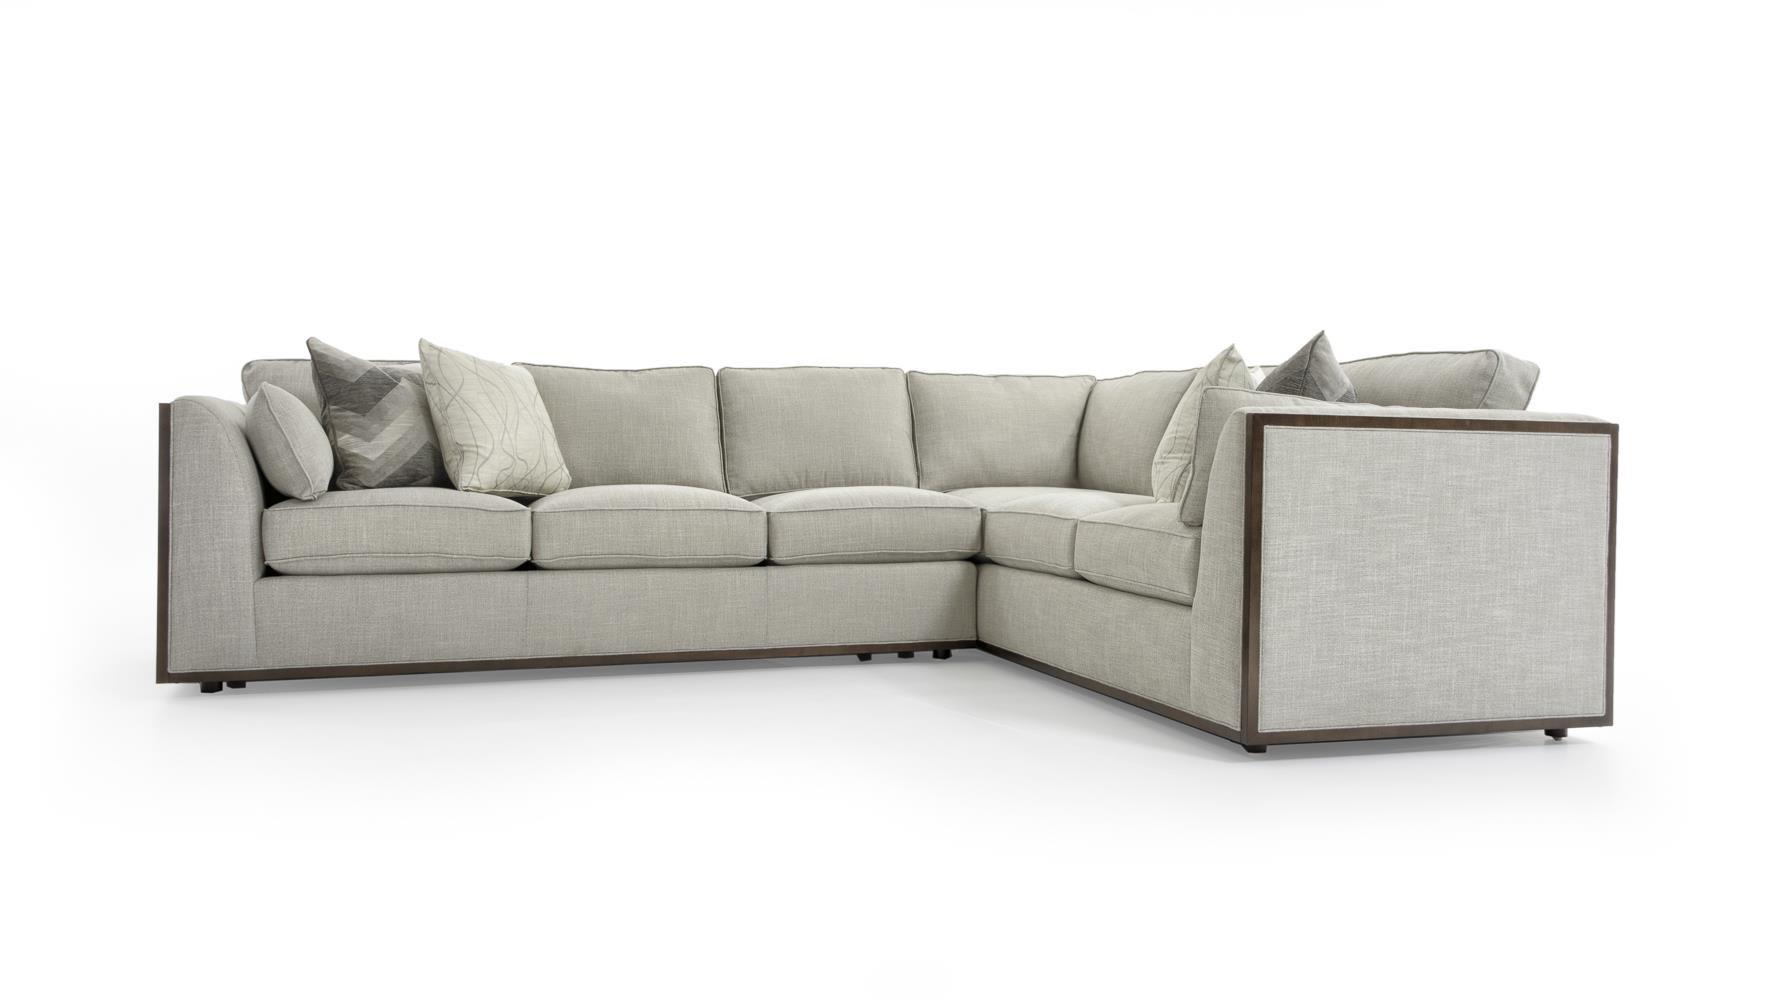 ... Lexington MacArthur ParkWestcliffe 2 Pc Sectional Sofa ...